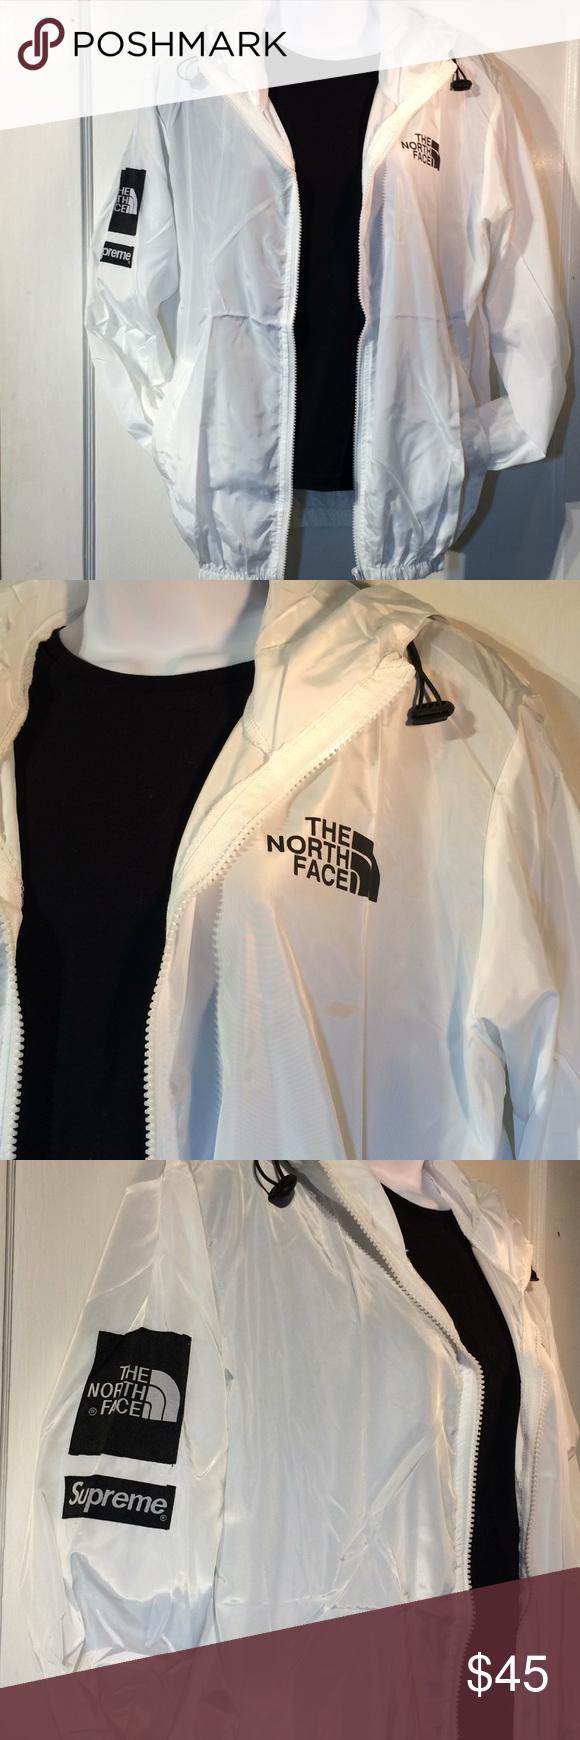 North Face Supreme White Full Zip Windbreaker This Is Nwt White Windbreaker From The North Face Supreme White Windbreaker North Face Jacket Clothes Design [ 1740 x 580 Pixel ]